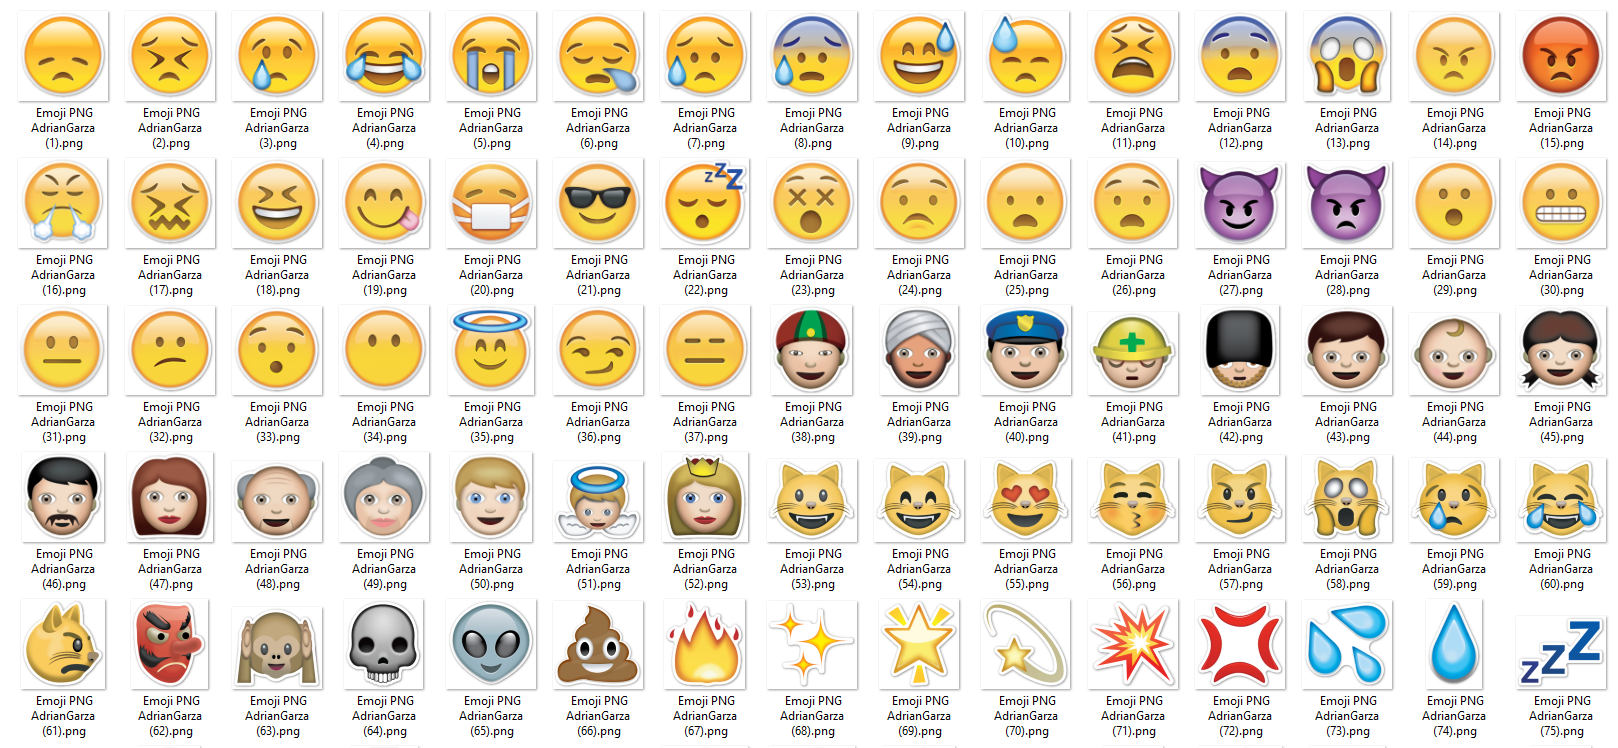 emojis whatsapp pack png sin fondo